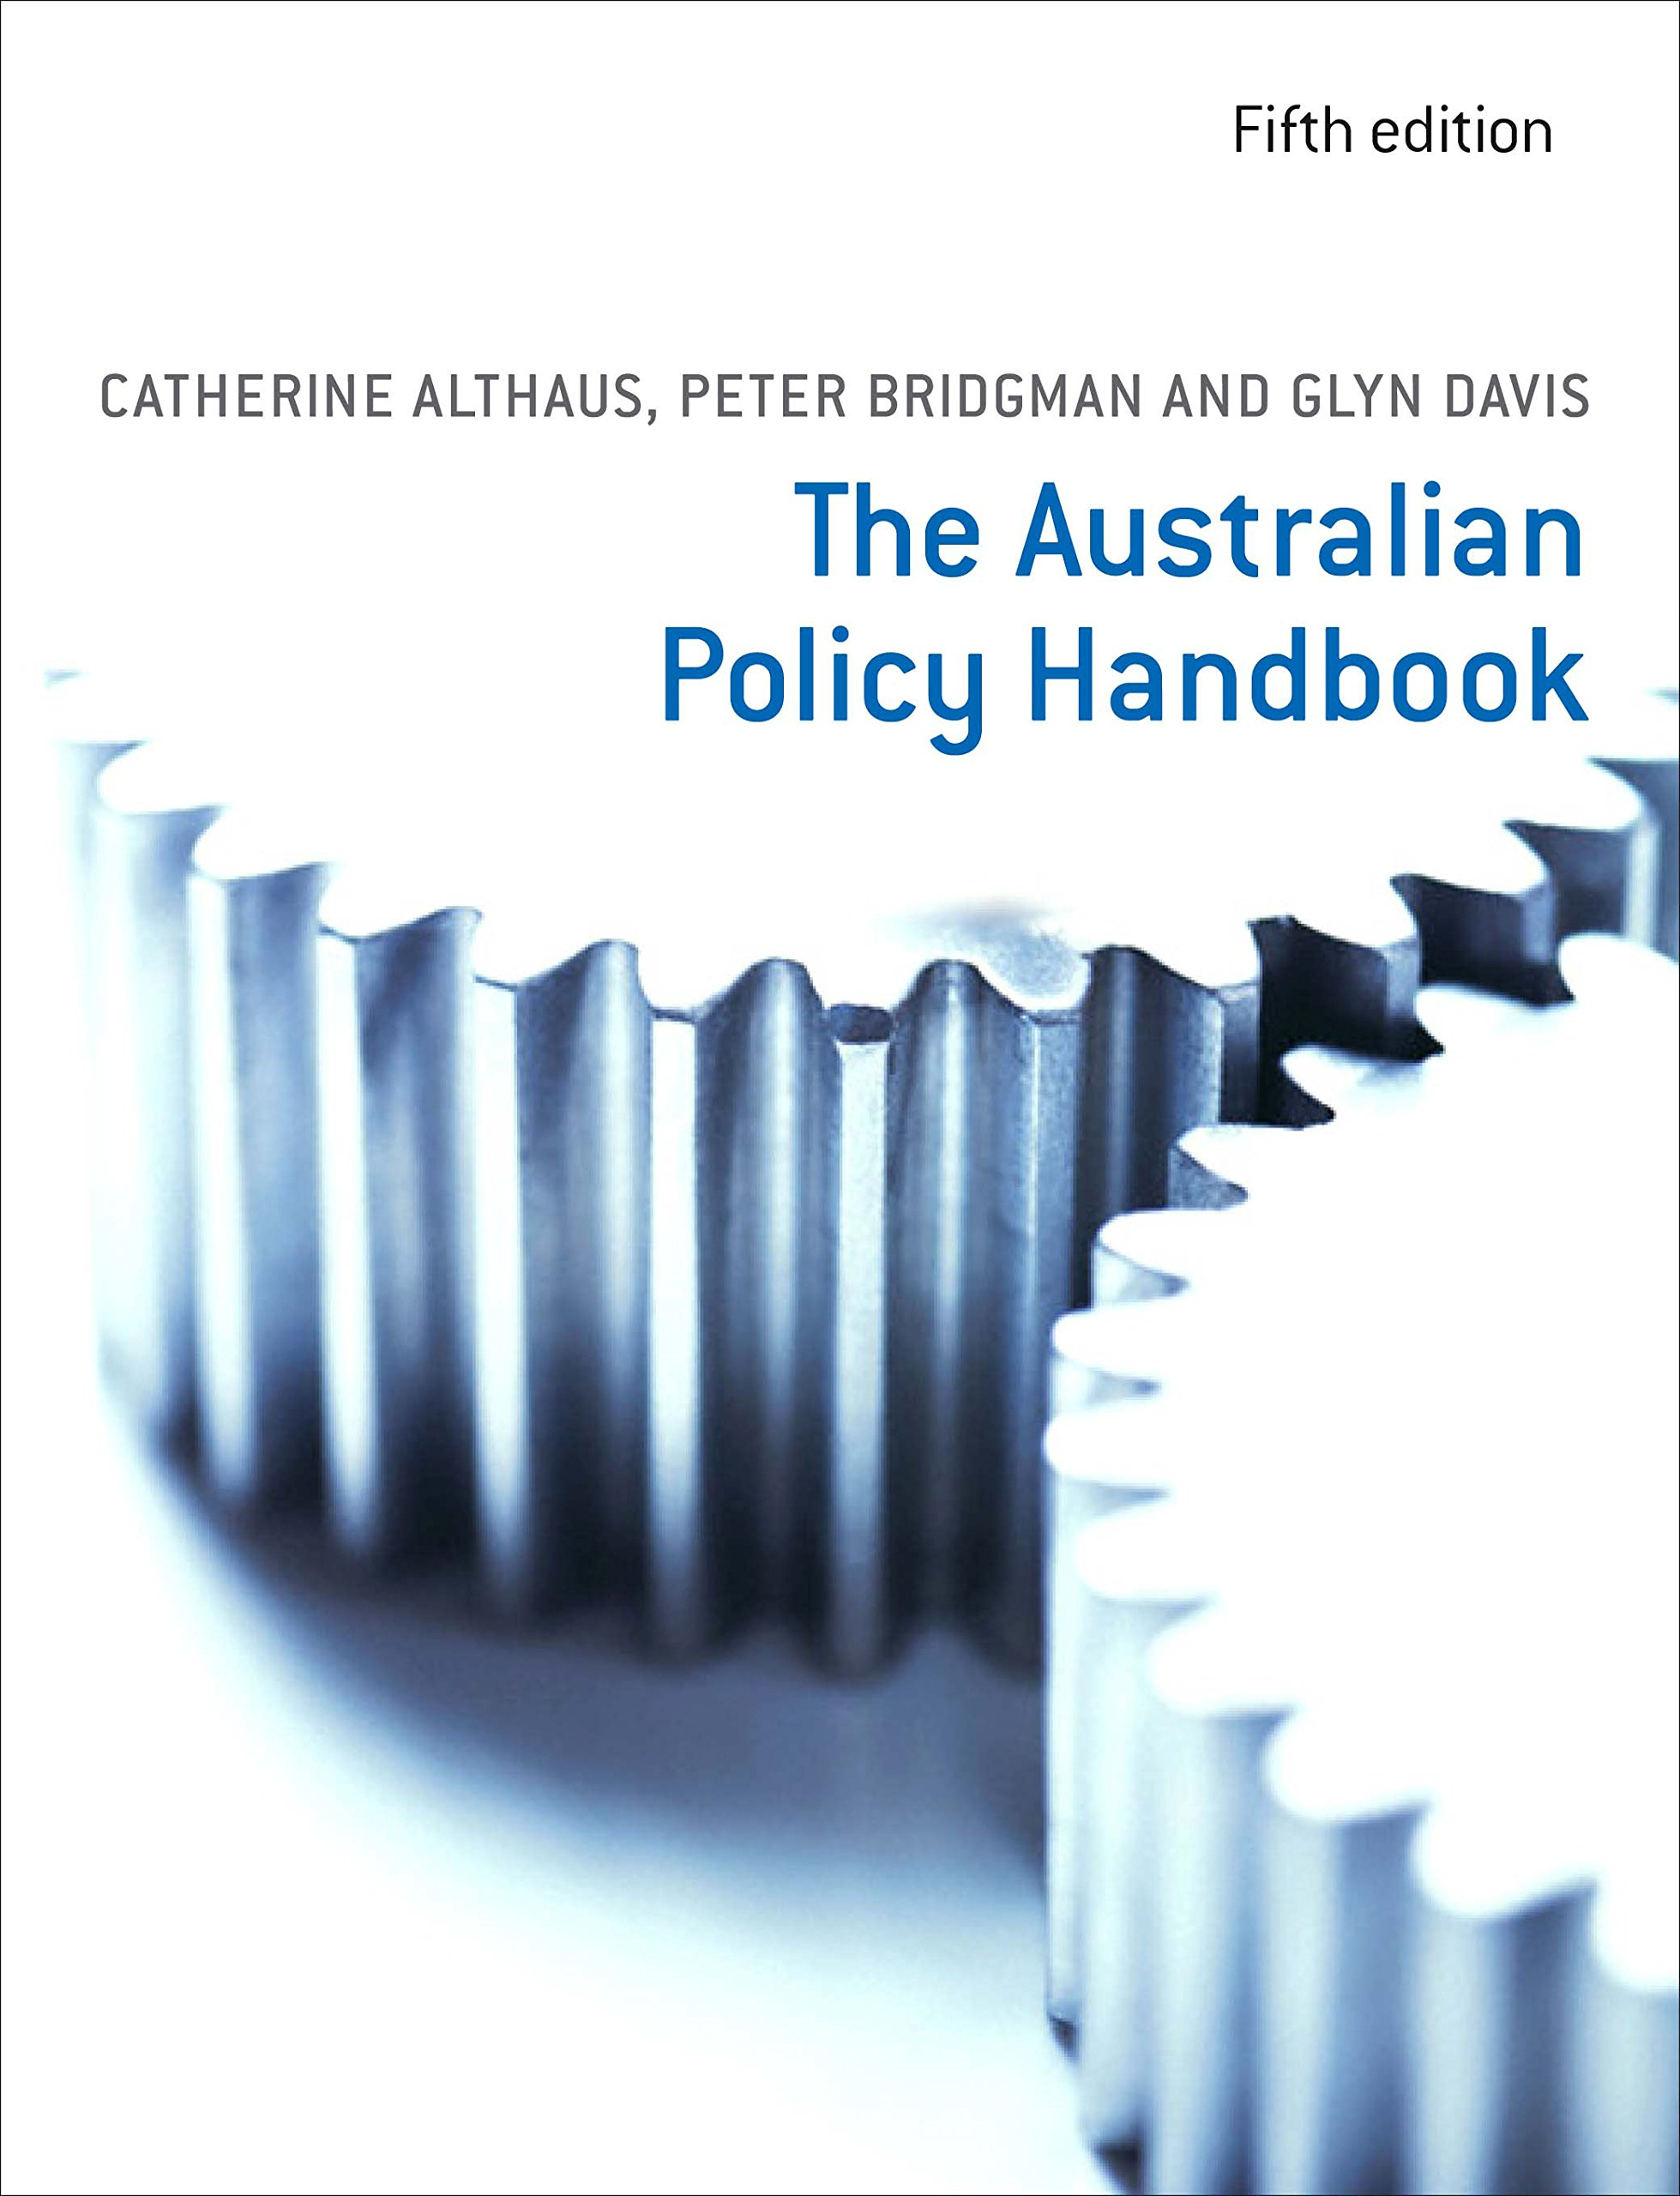 amazon the australian policy handbook catherine althaus peter